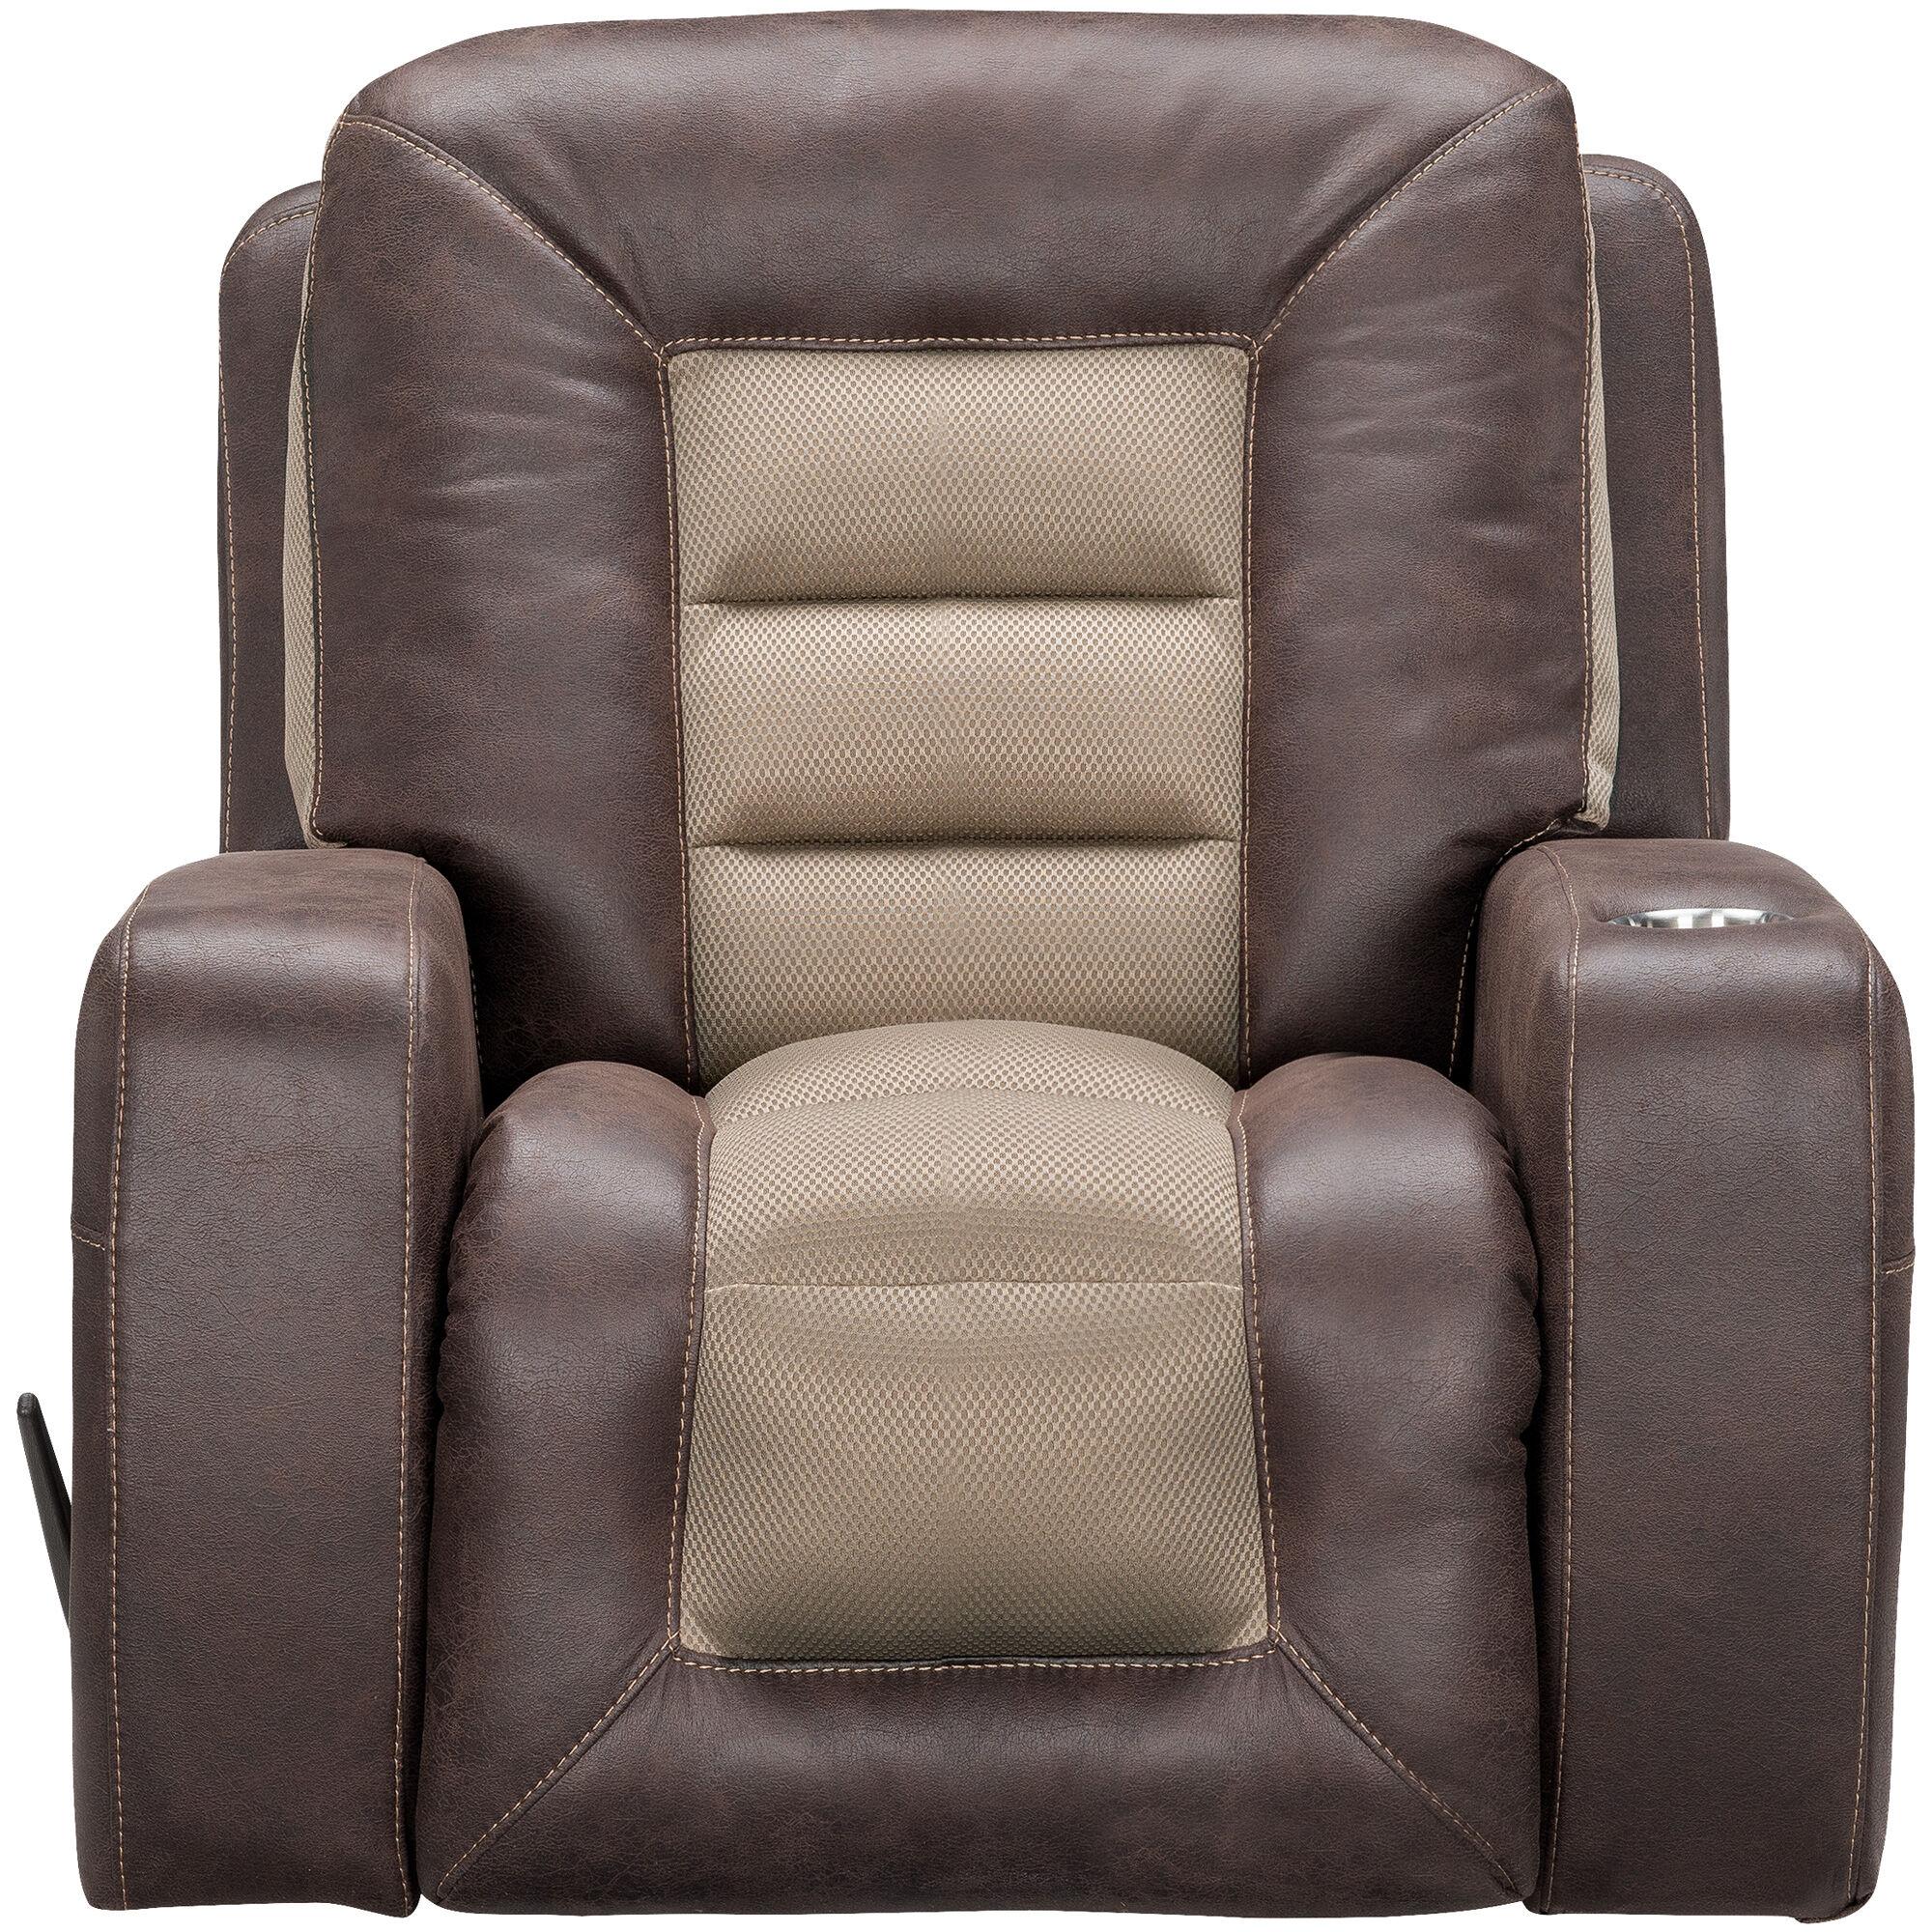 Slumberland Furniture  Malone Umber Rocker Recliner